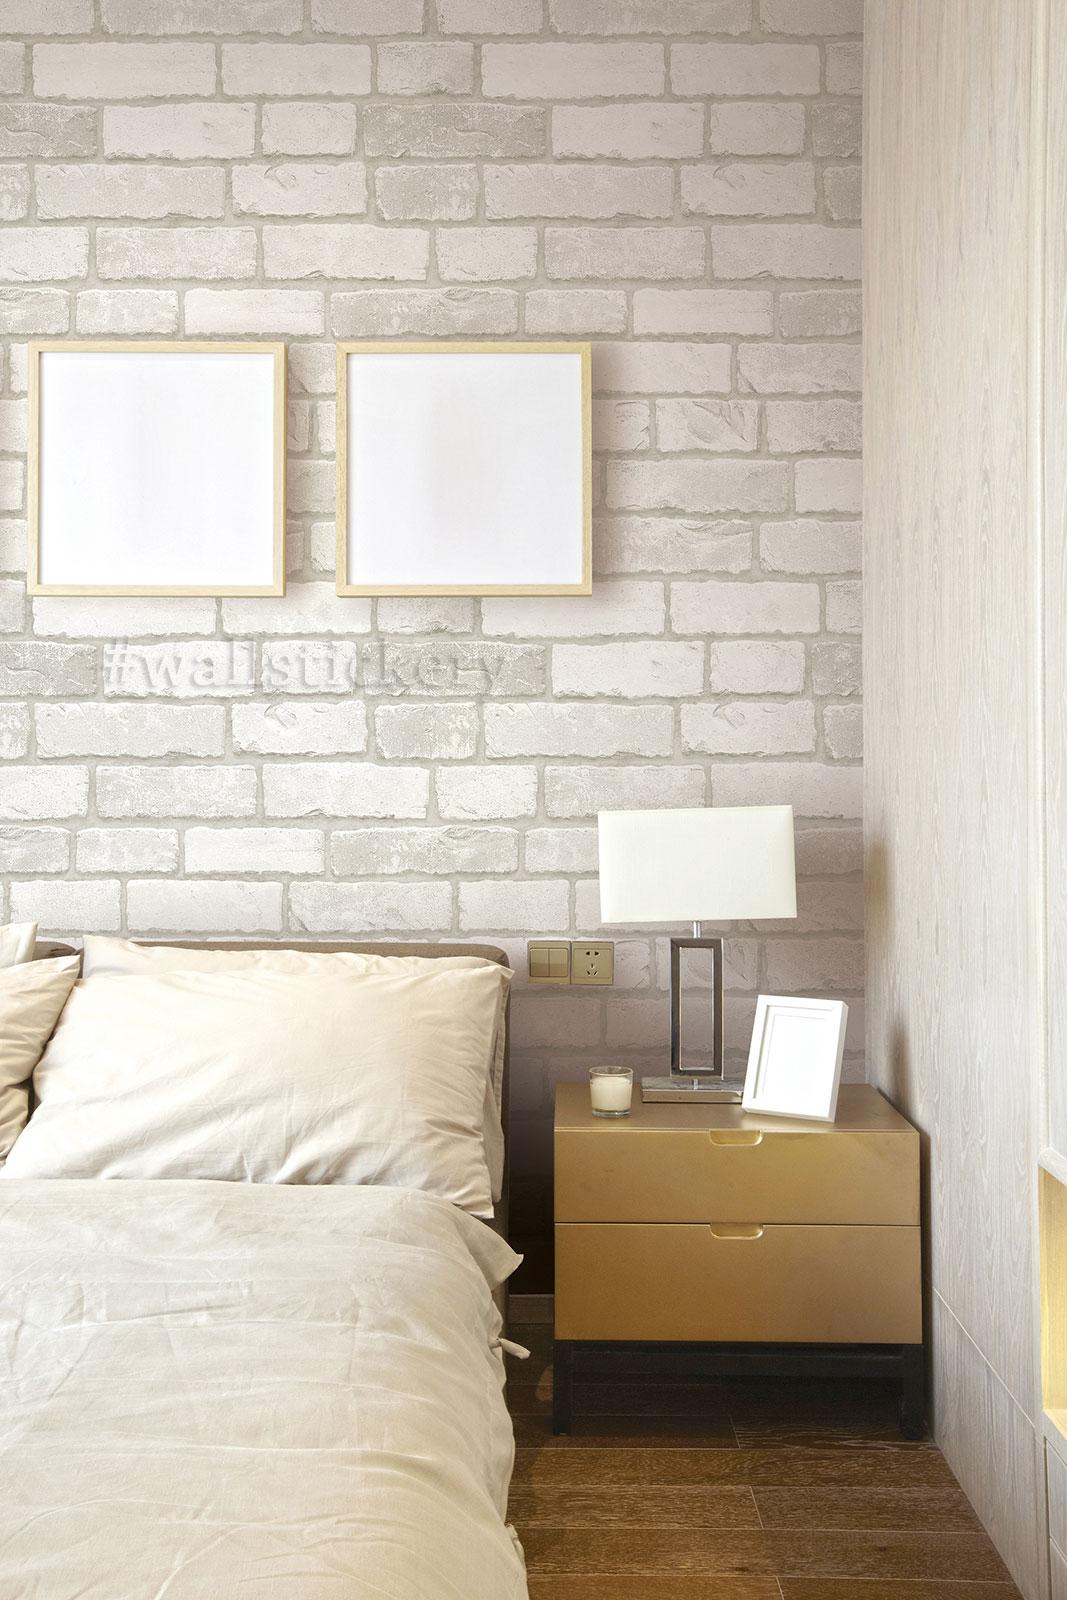 White Grey Brick Contact Paper Peel Stick Wallpaper Wood And Brick Accent Walls 1067x1600 Download Hd Wallpaper Wallpapertip